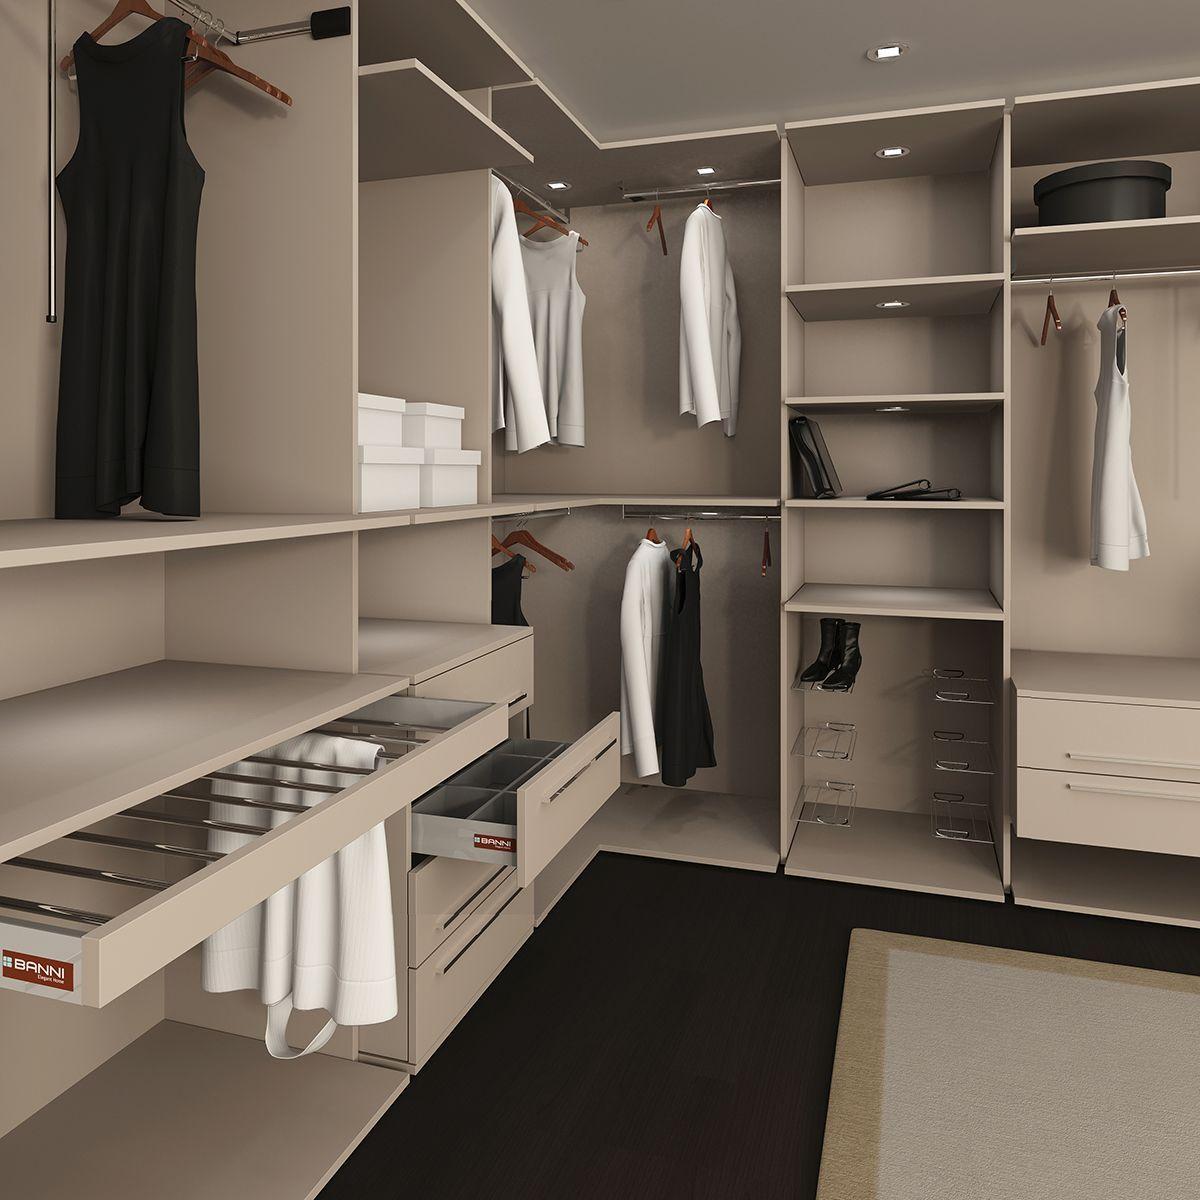 Vestir armarios por dentro ideas para organizar los - Vestir armarios por dentro ...